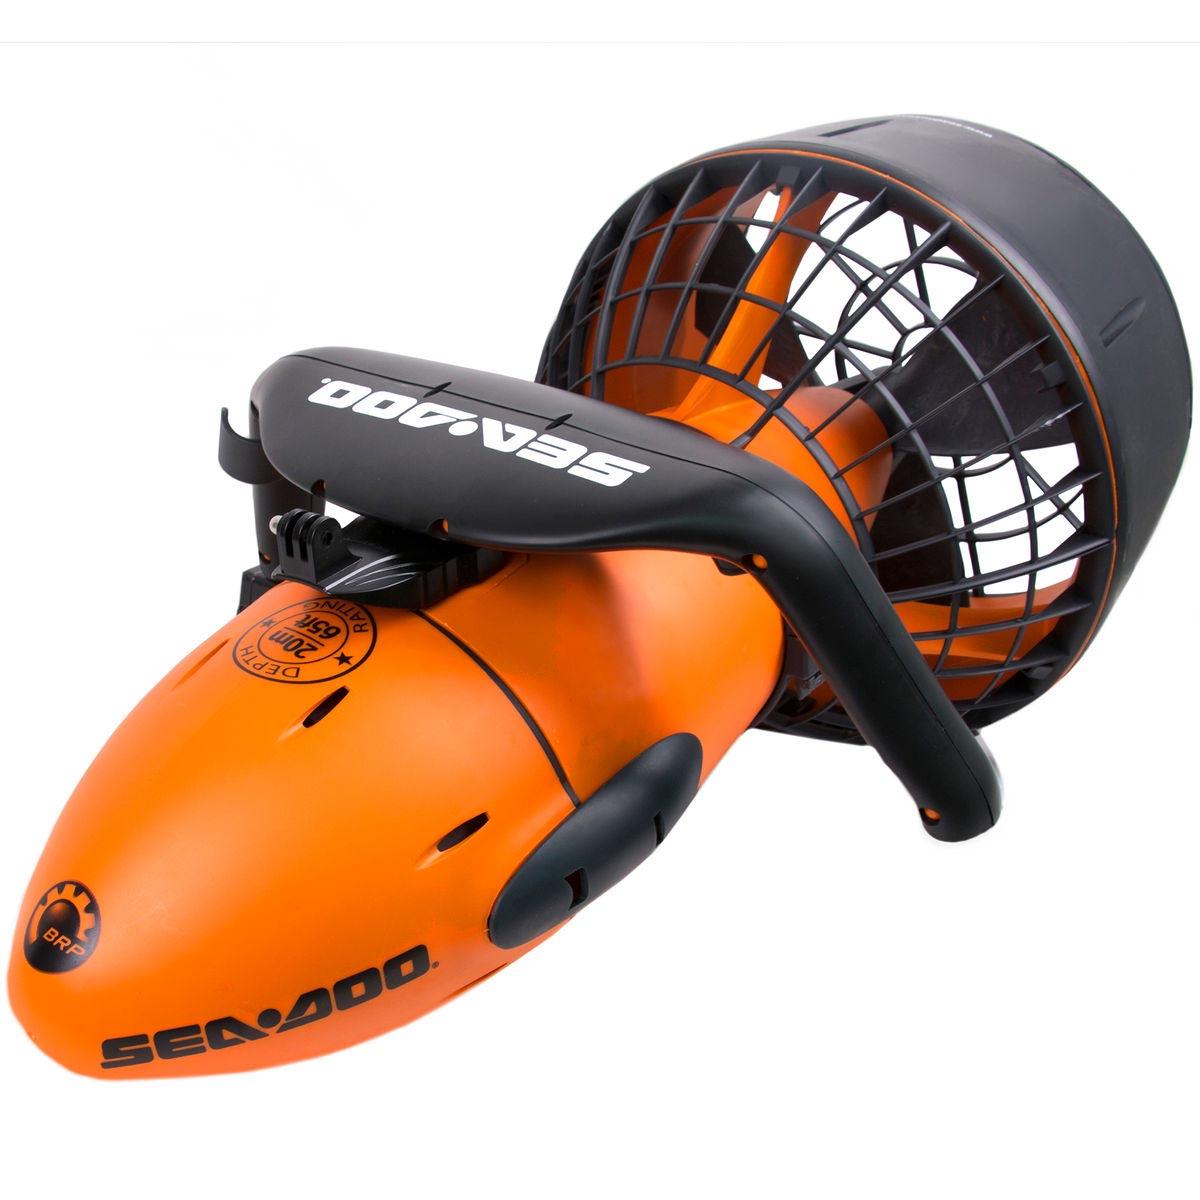 Sea Doo Pro Scooter